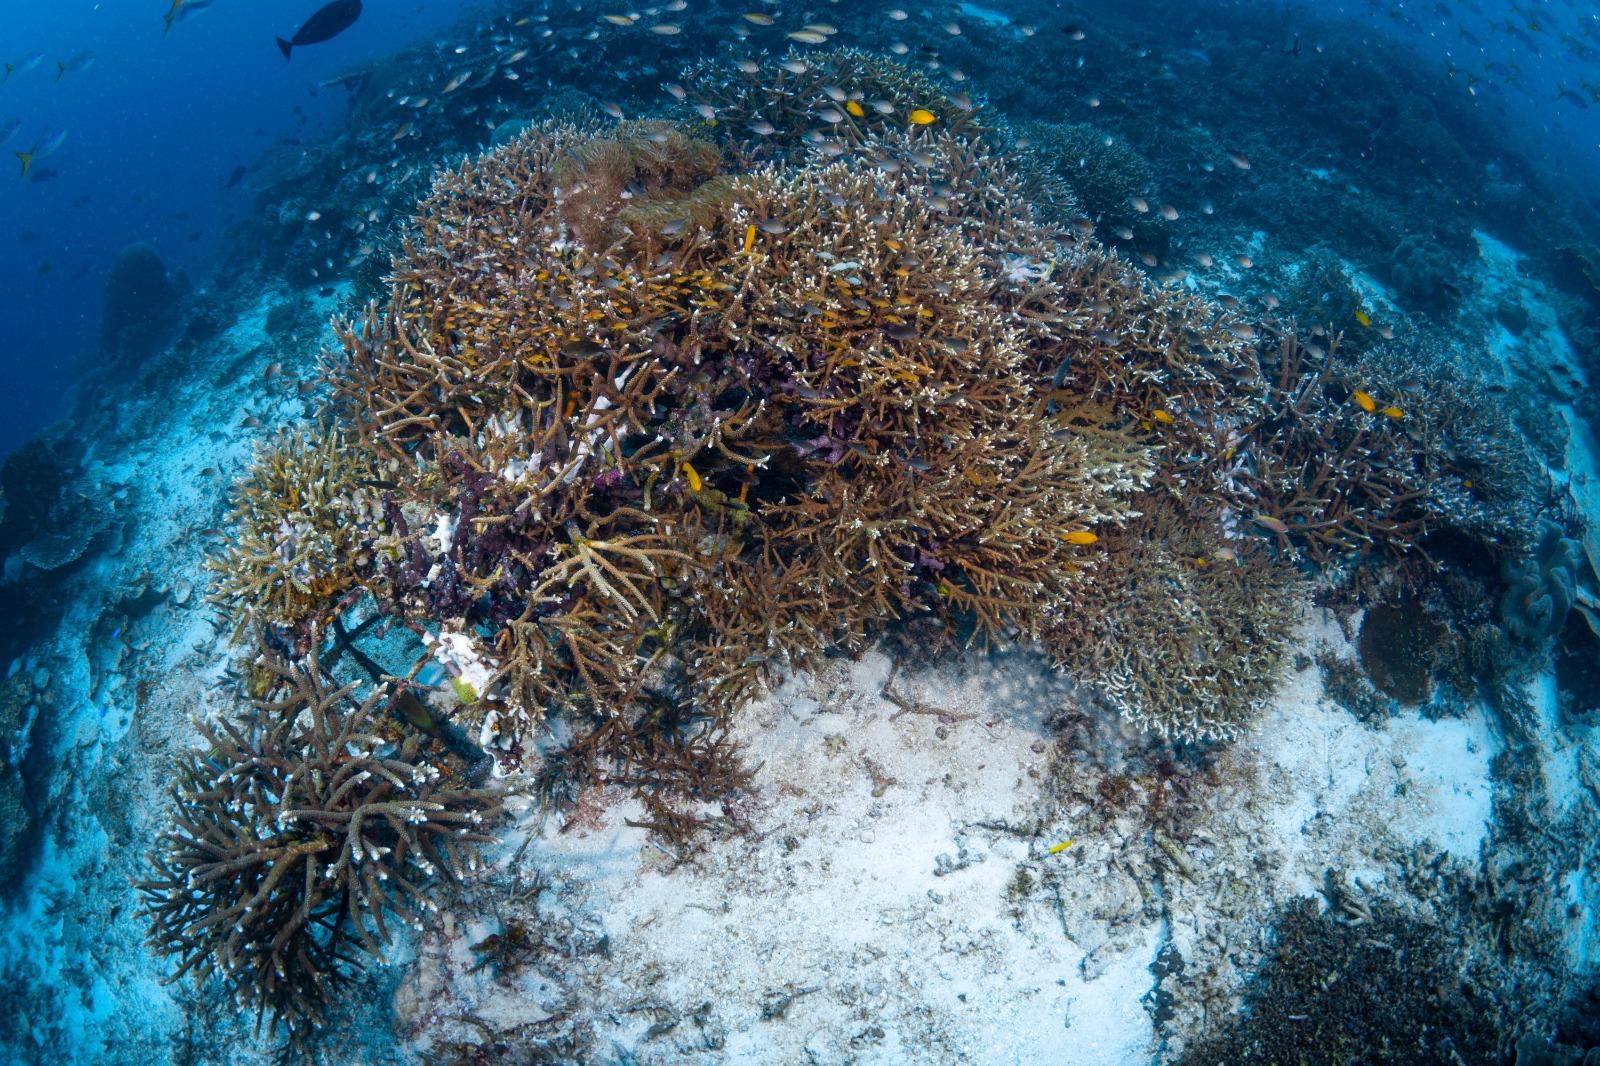 Coral Planting in Raja Ampat during COVID-19